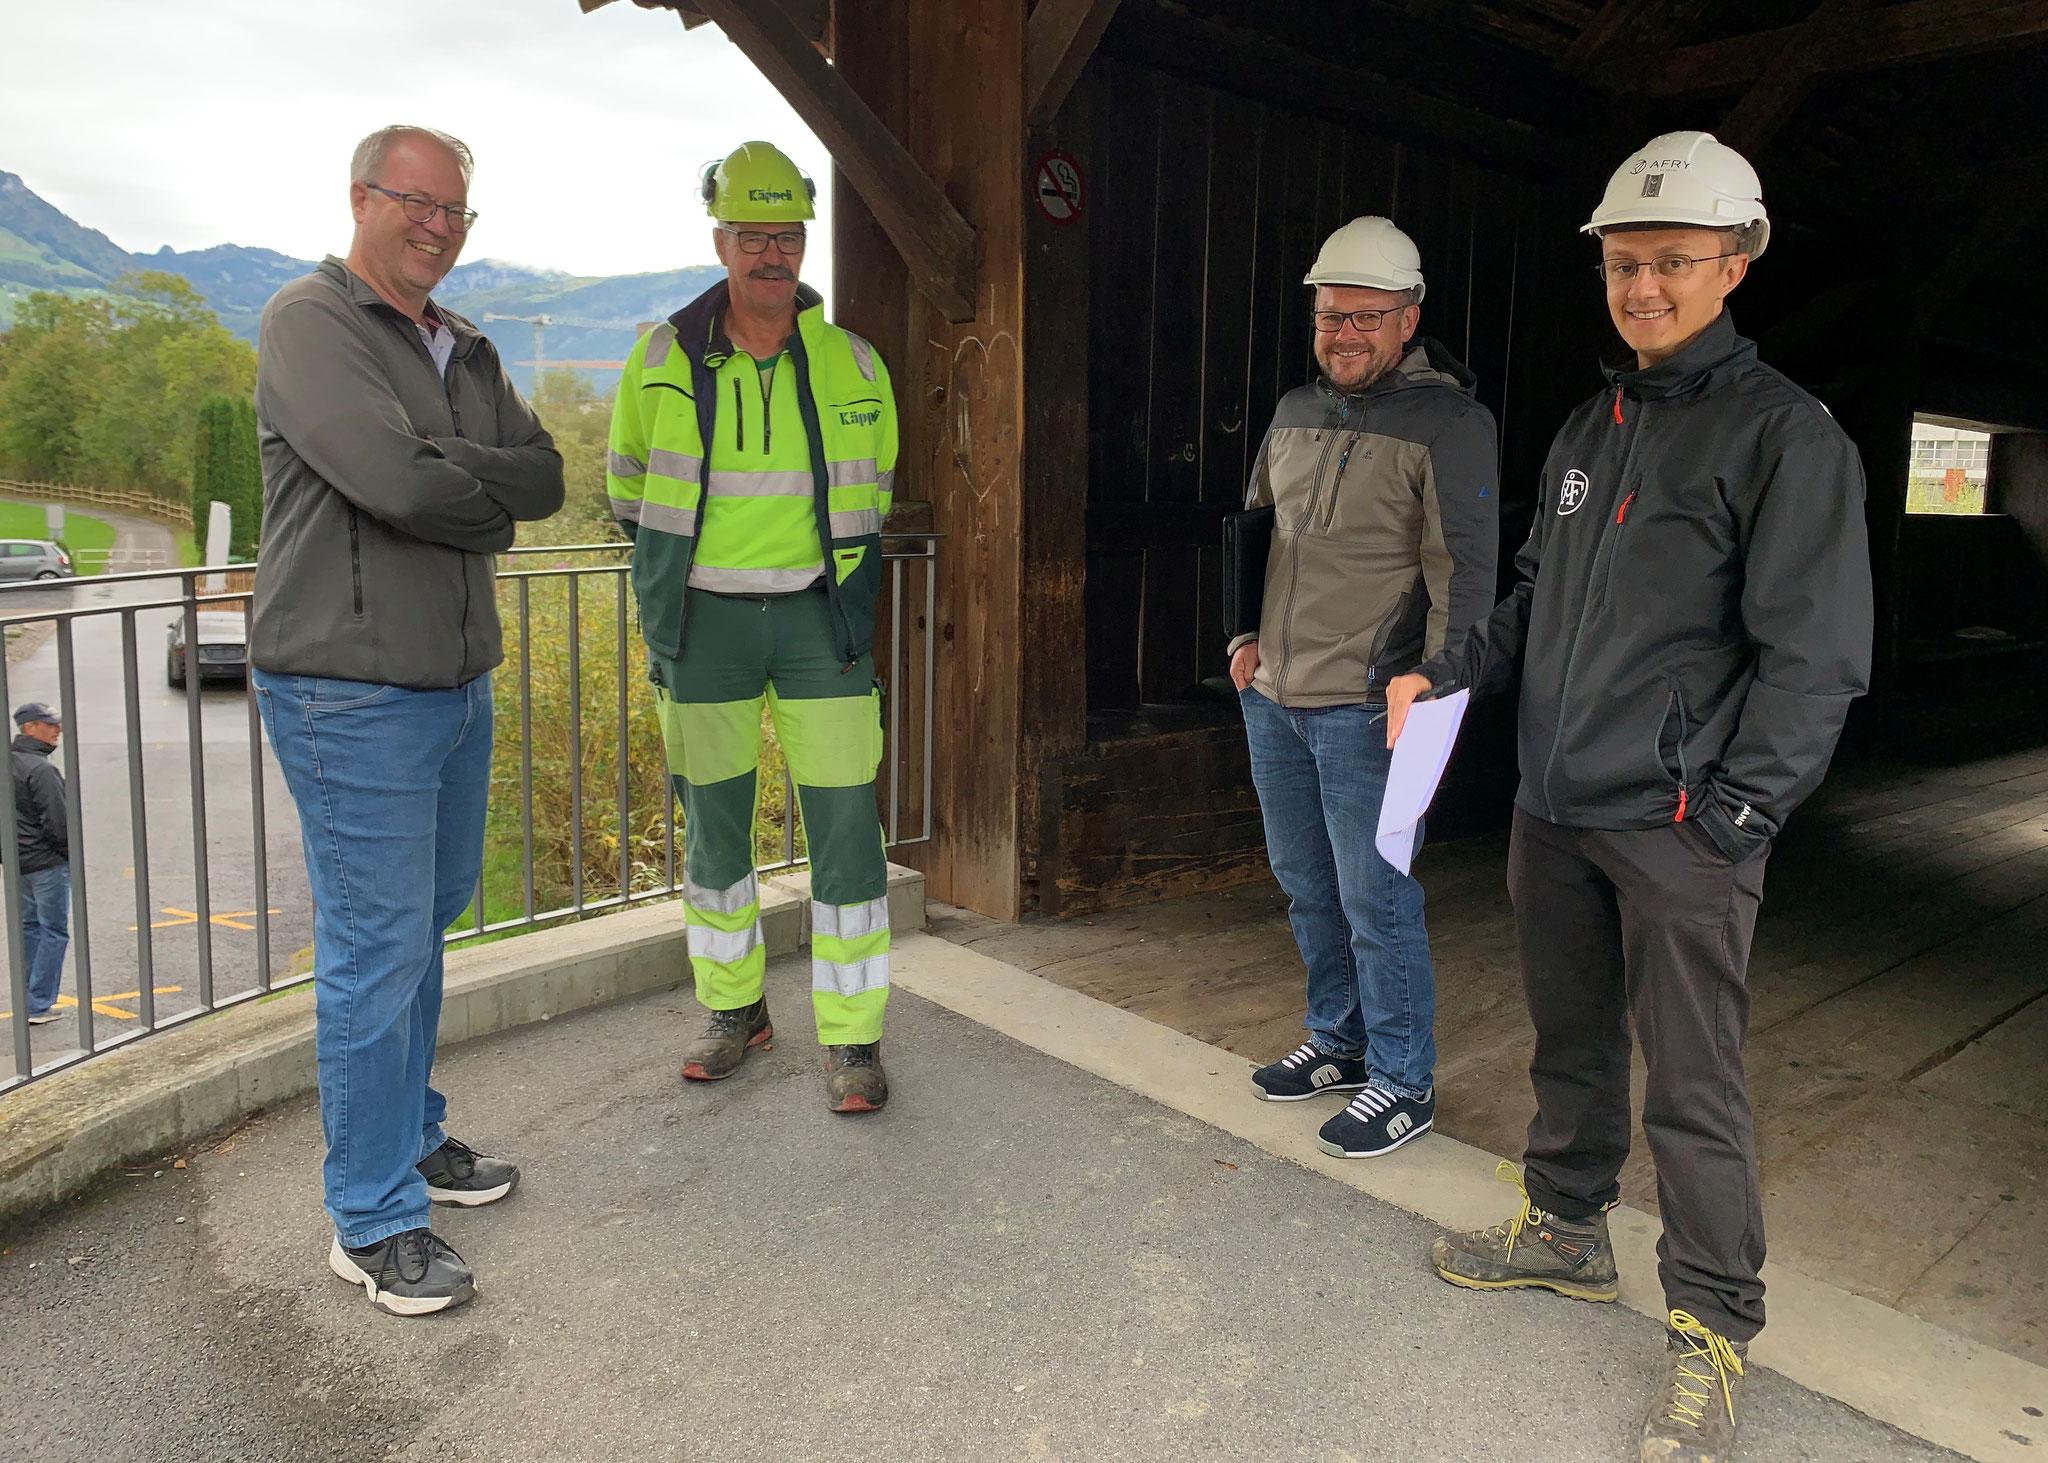 Die Führungscrew, v.l.n.r.: Markus Tonazzi, Bauführer; Joe Weber Polier; Albert Lüönd, Bauherrenvertreter; Riste Janevski, Bauleitung